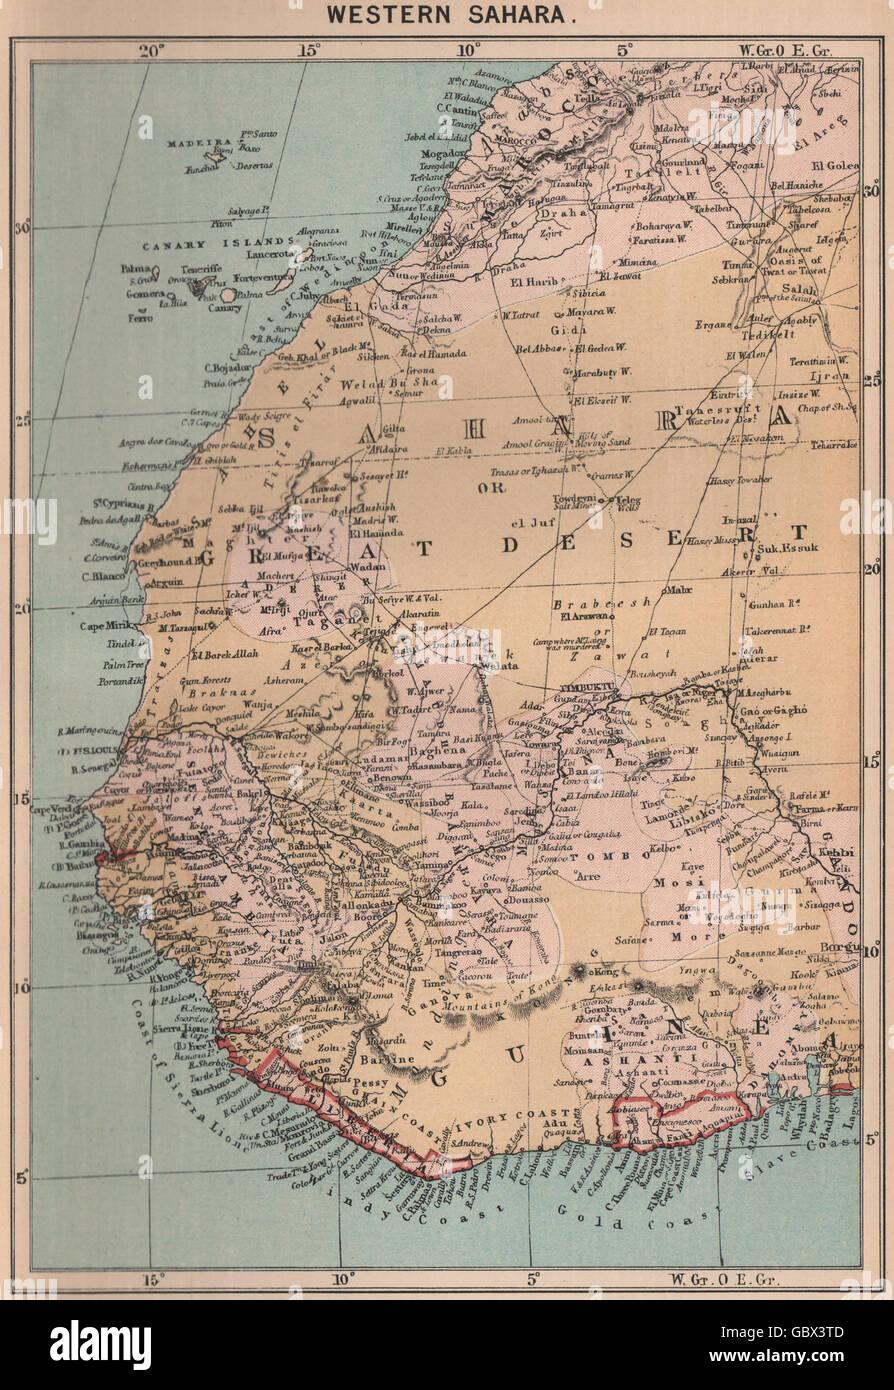 Western Sahara. Africa, 1885 antique map Stock Photo ... on arabian peninsula map, sudan map, namib map, congo basin map, great rift valley map, atlas mountains map, mecca map, gobi map, lake tanganyika map, zambezi river map, zagros mountains map, red sea map, kalahari map, madagascar map, desert map, sahel map, cape of good hope map, taurus mountains map, atacama map, africa map,